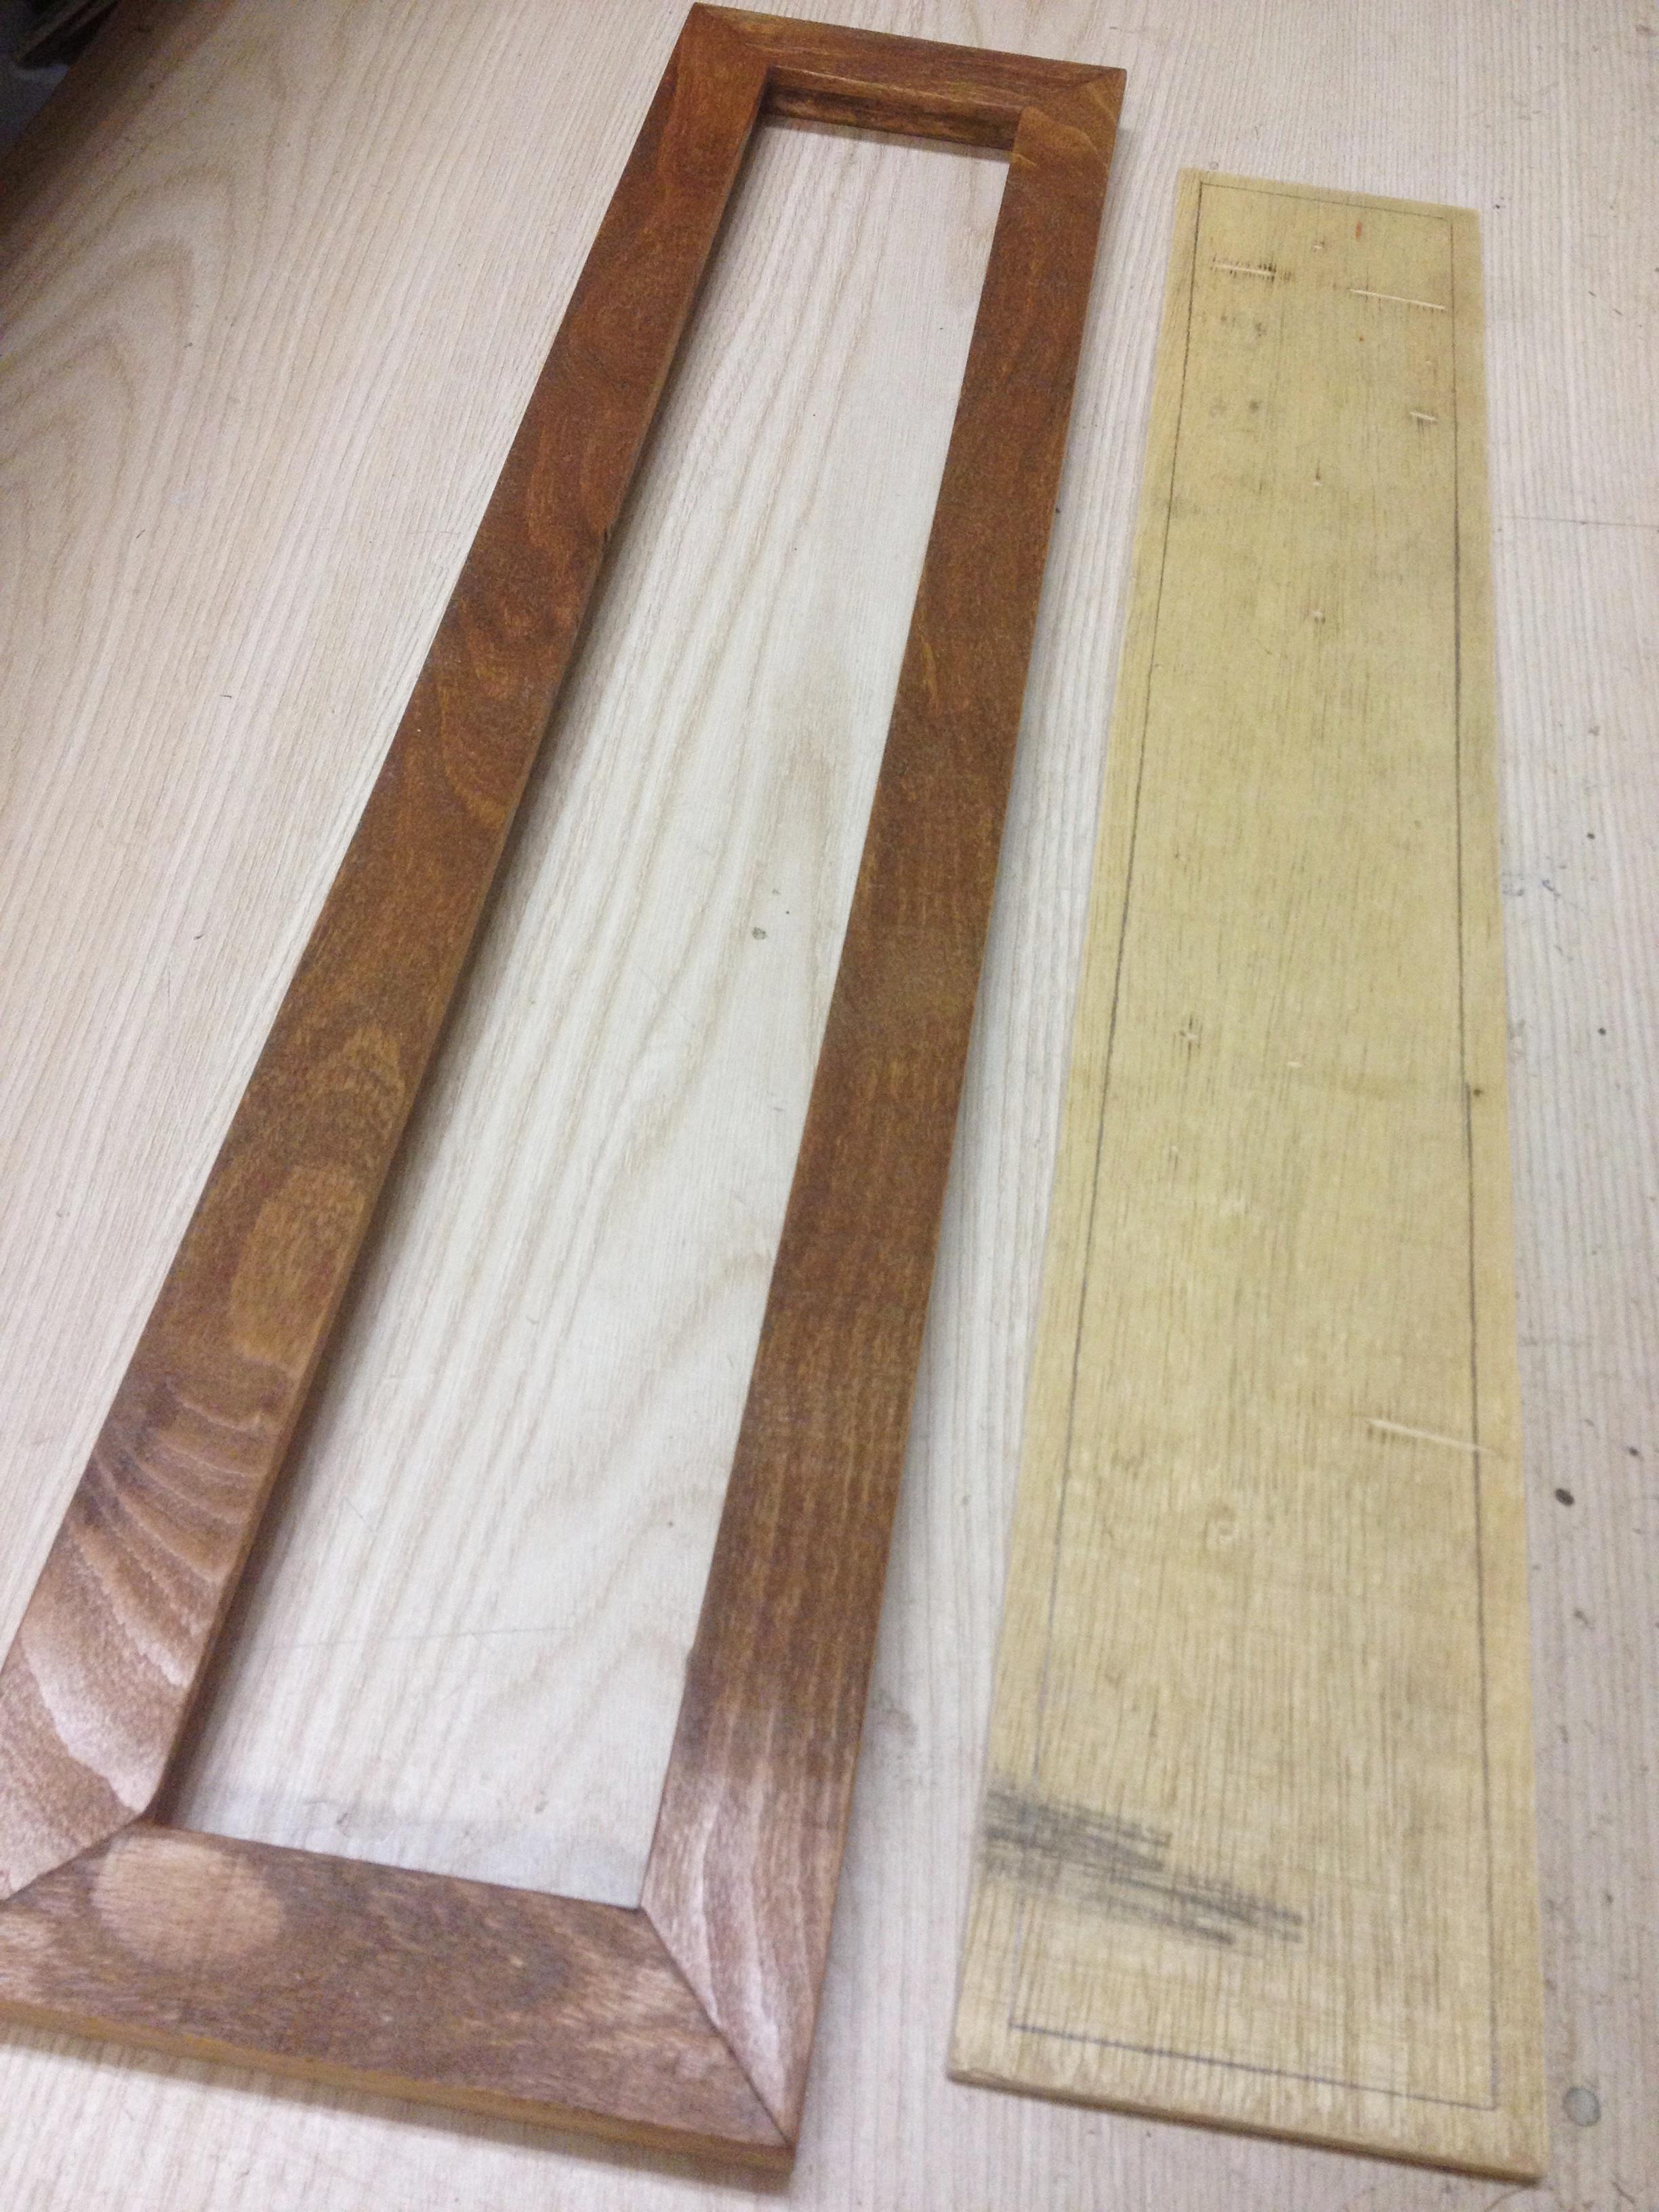 Handmade frame and prepared mosaic backer board for a mosaic coat track,